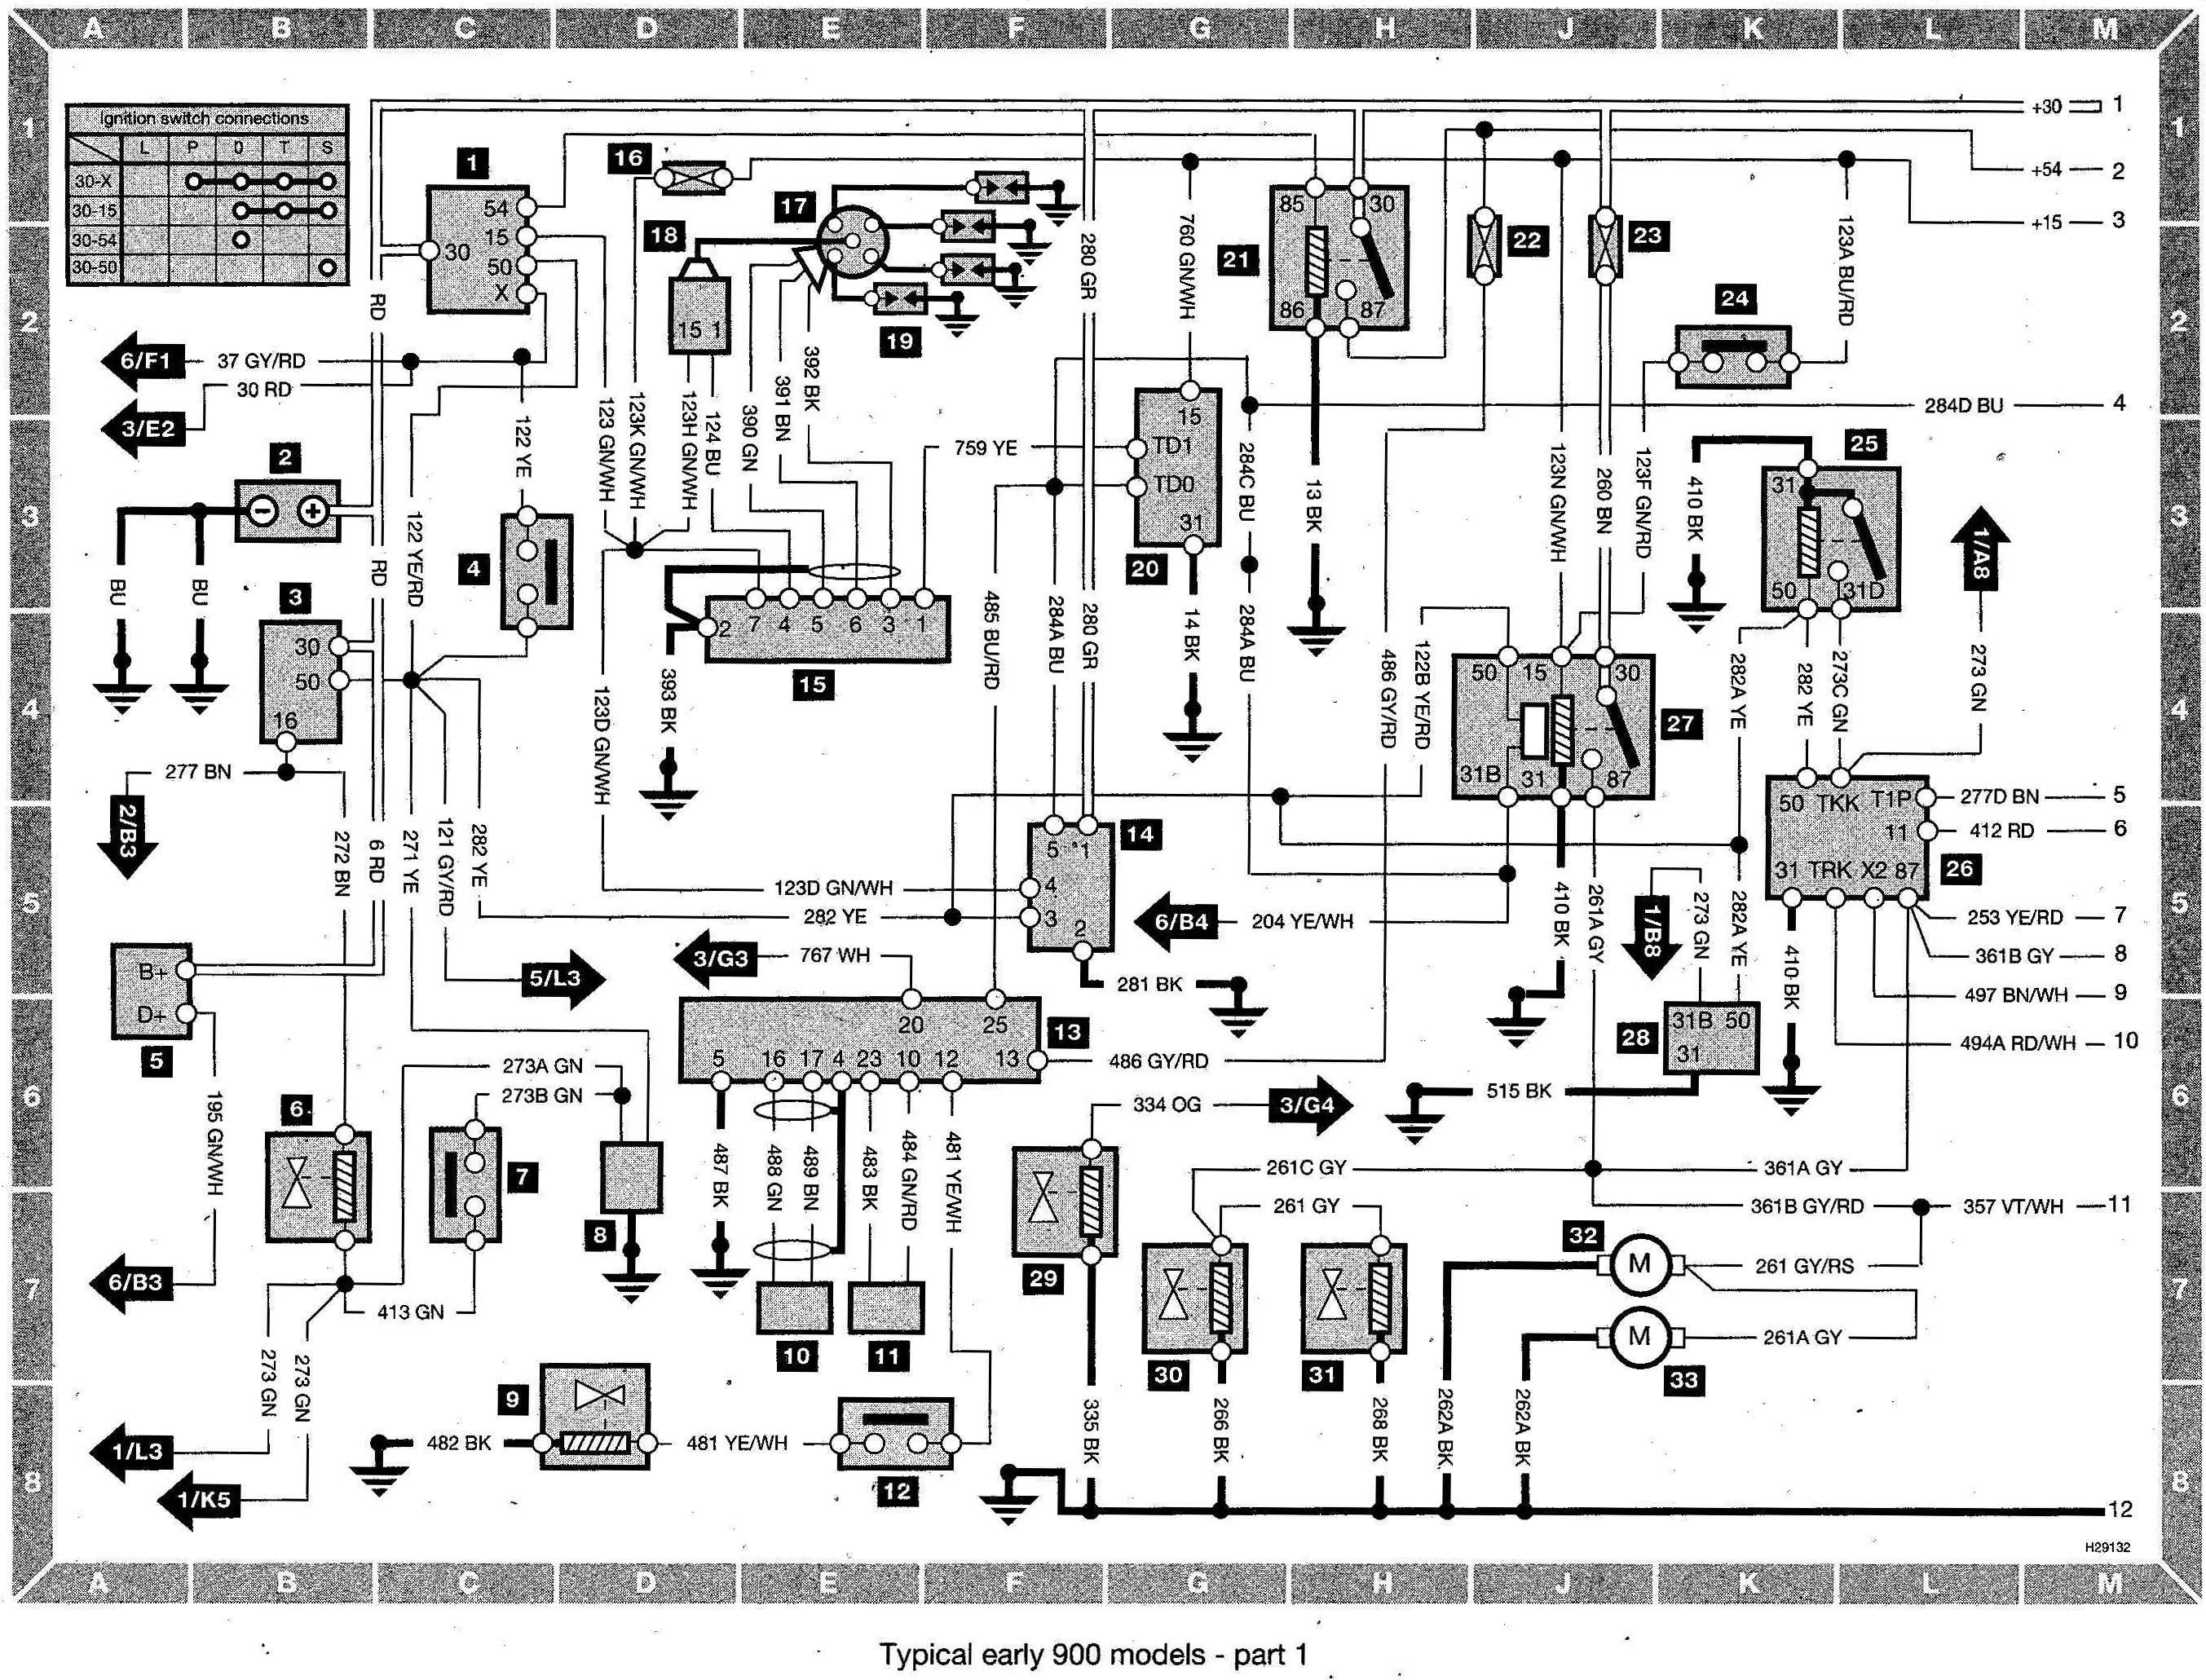 saab 9 3 2003 front headlight wiring diagram  u2022 wiring